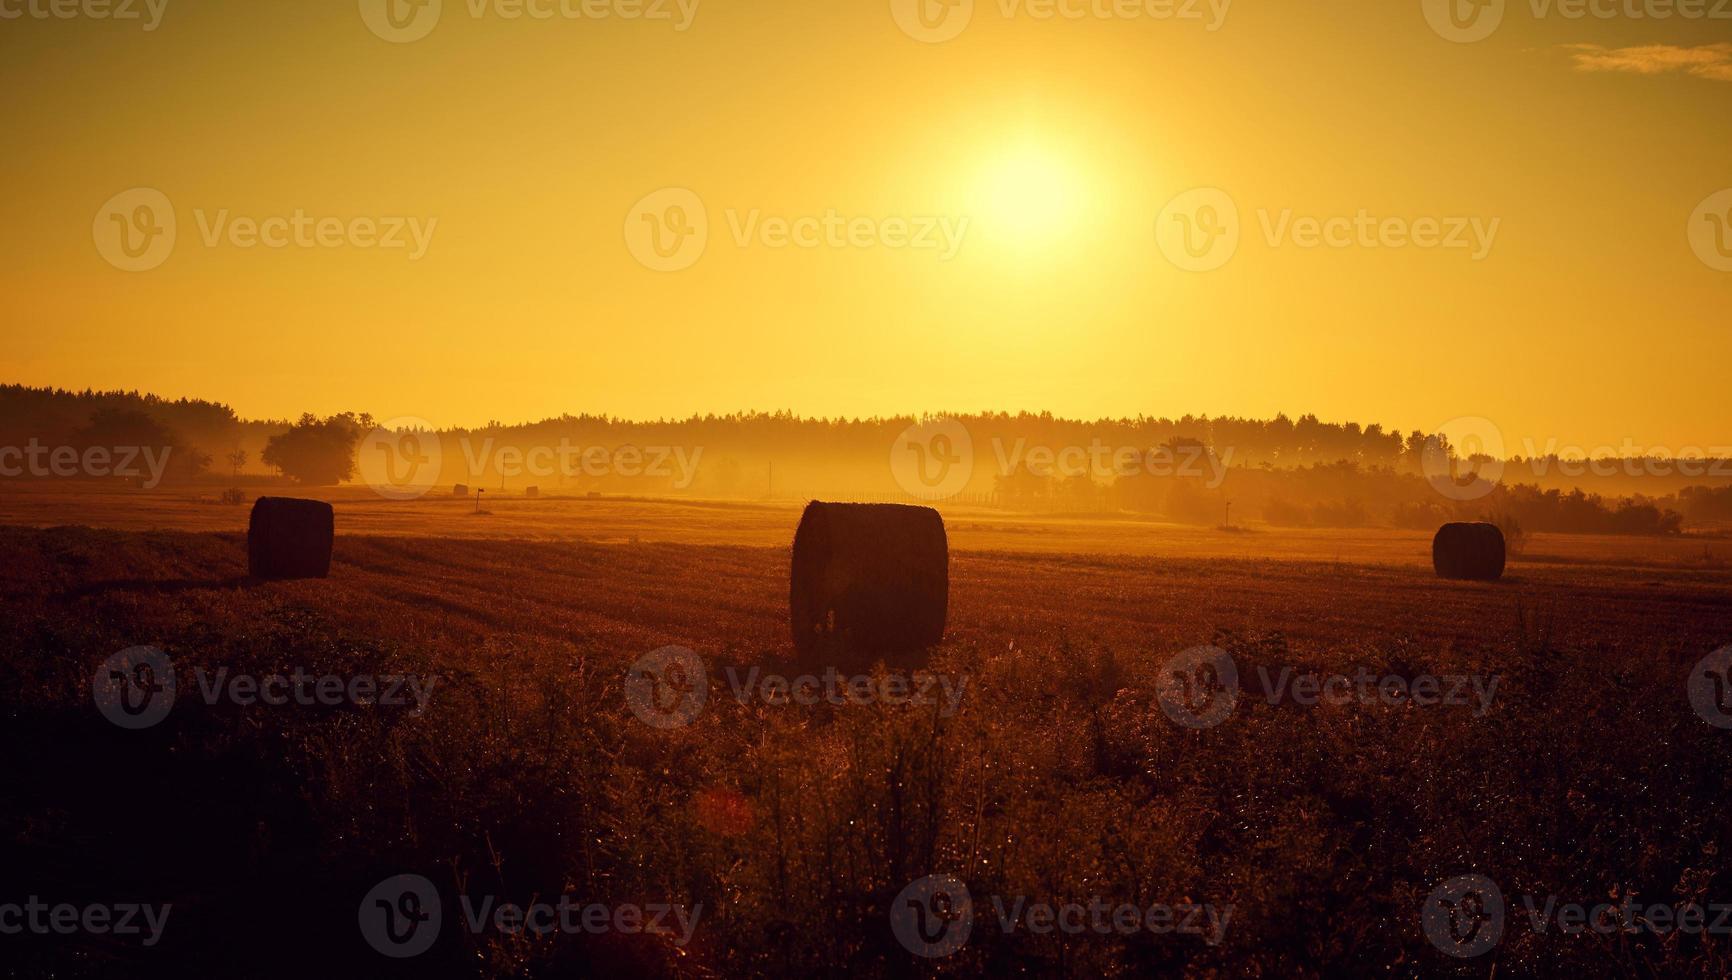 zomer zonsondergang foto